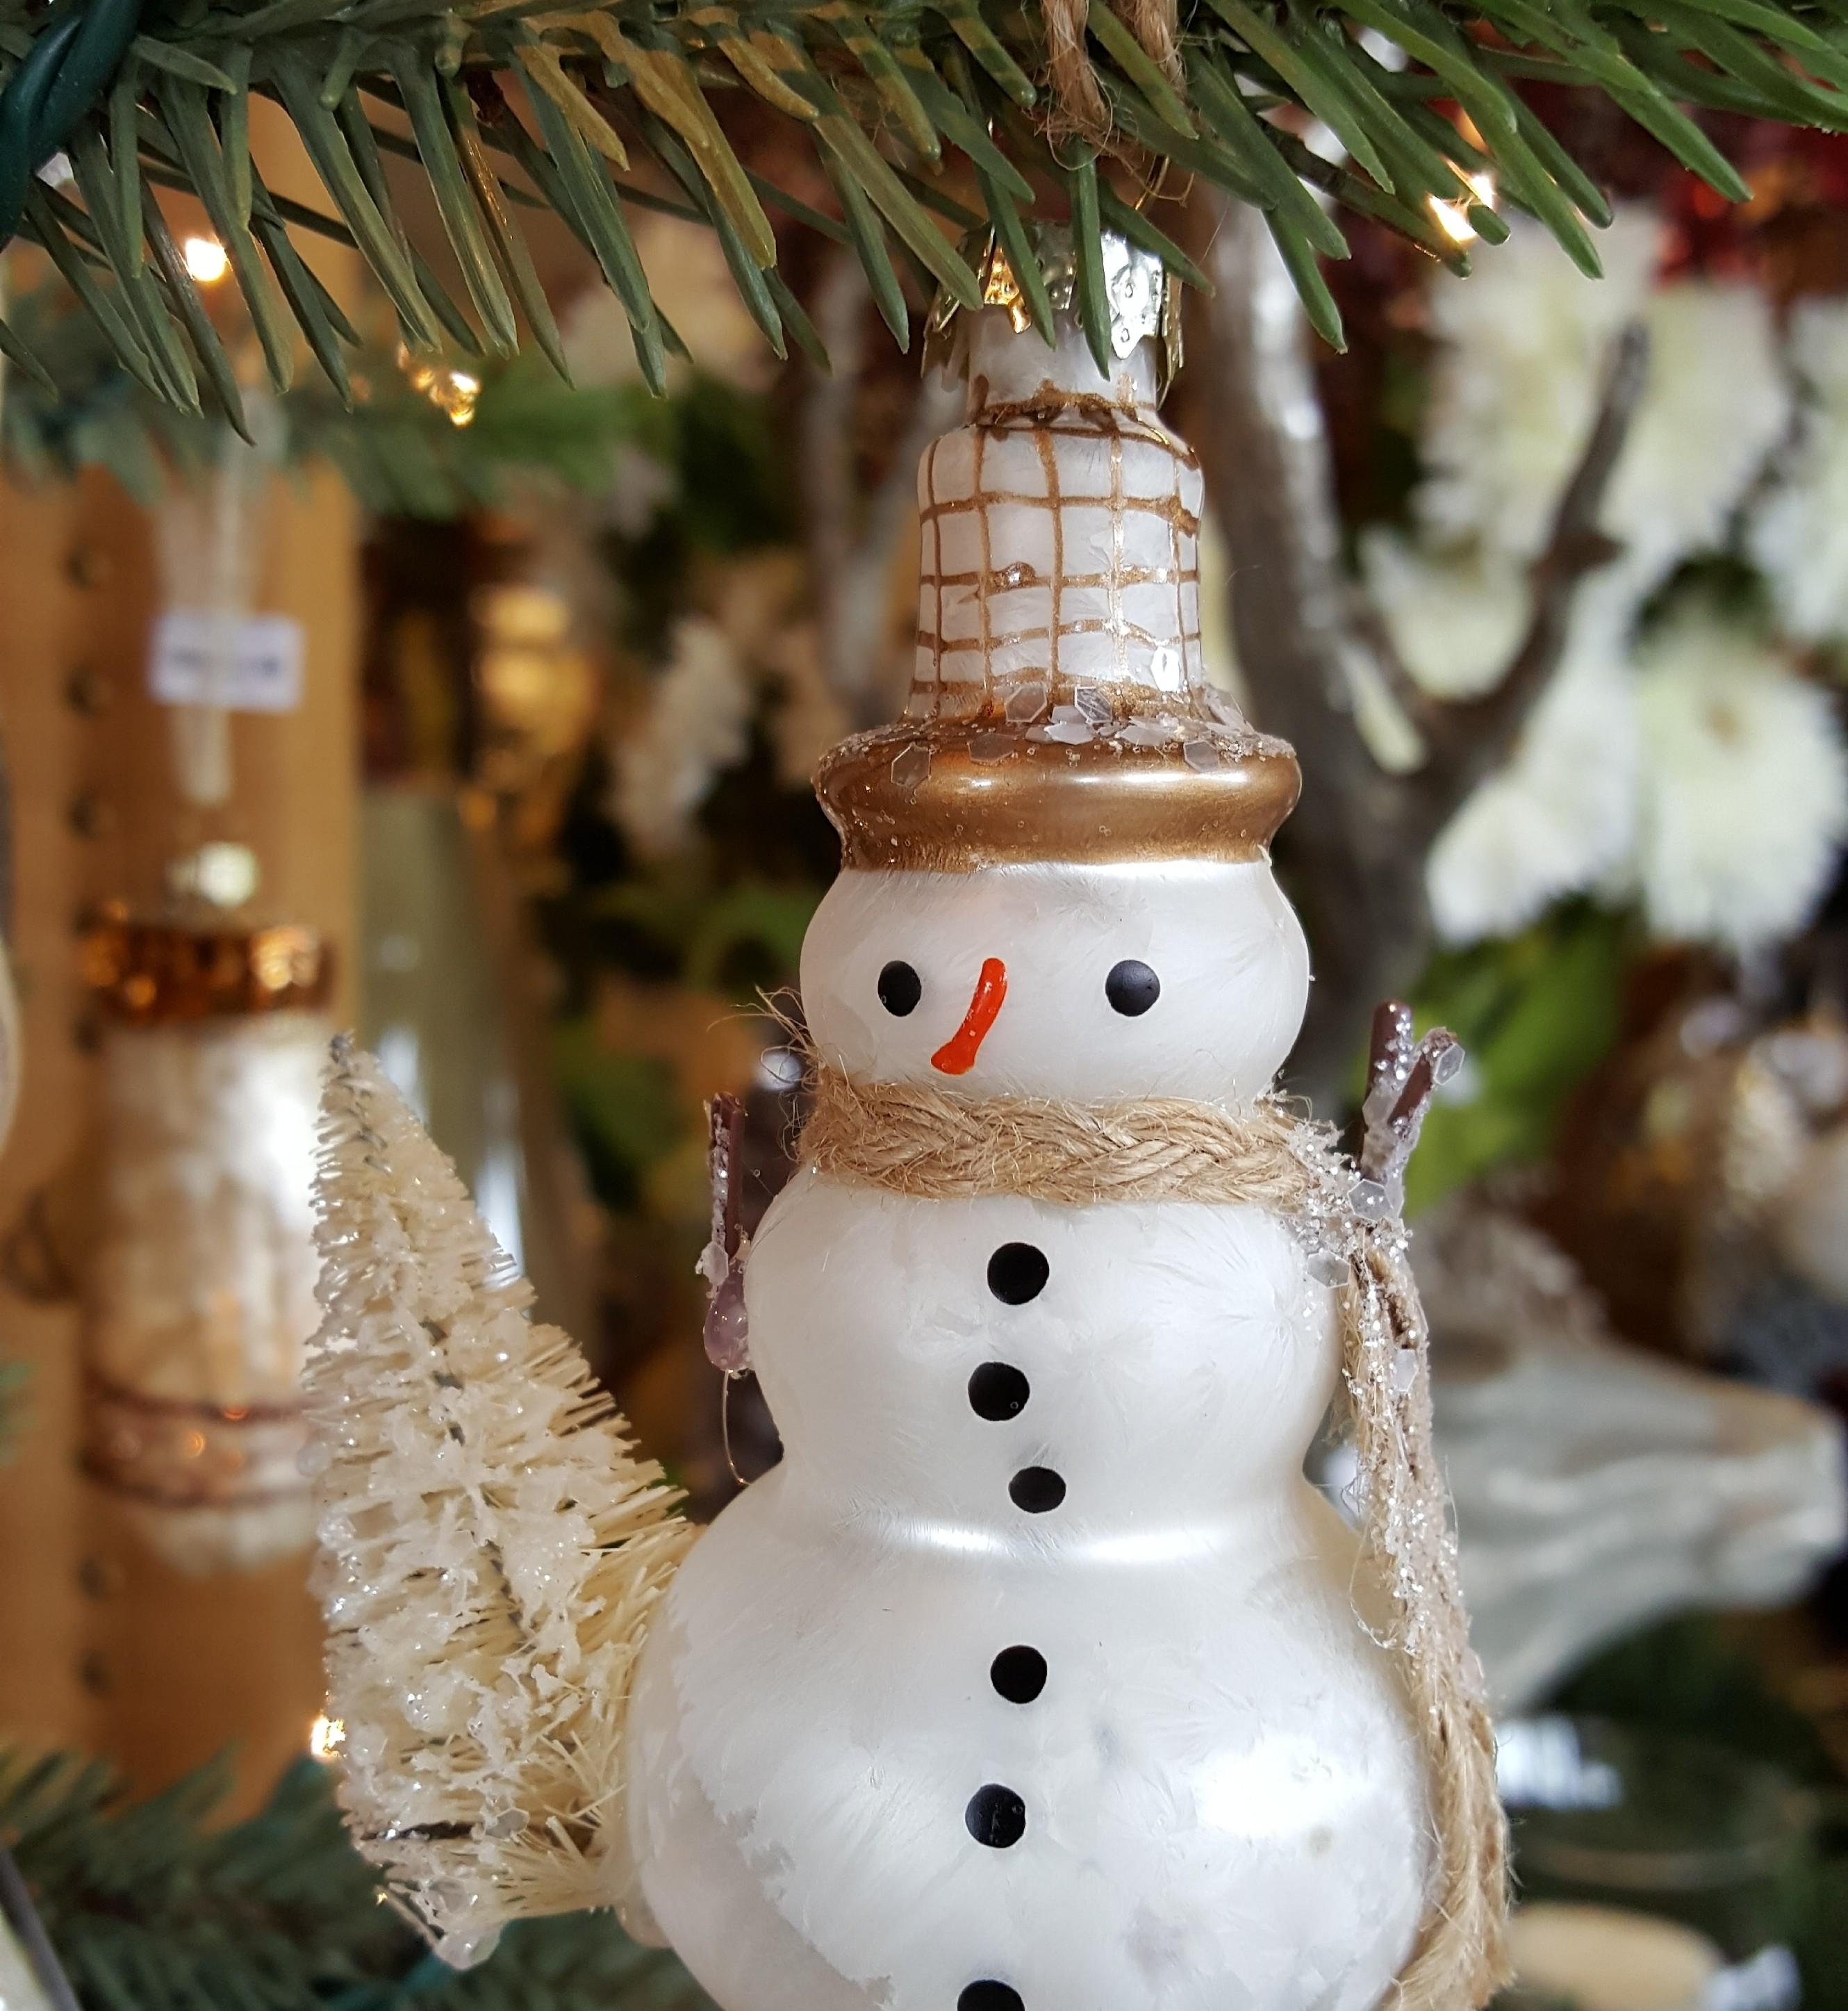 Bethany_Lowe_American_artist_figurines_seasonal_collectible_detailed